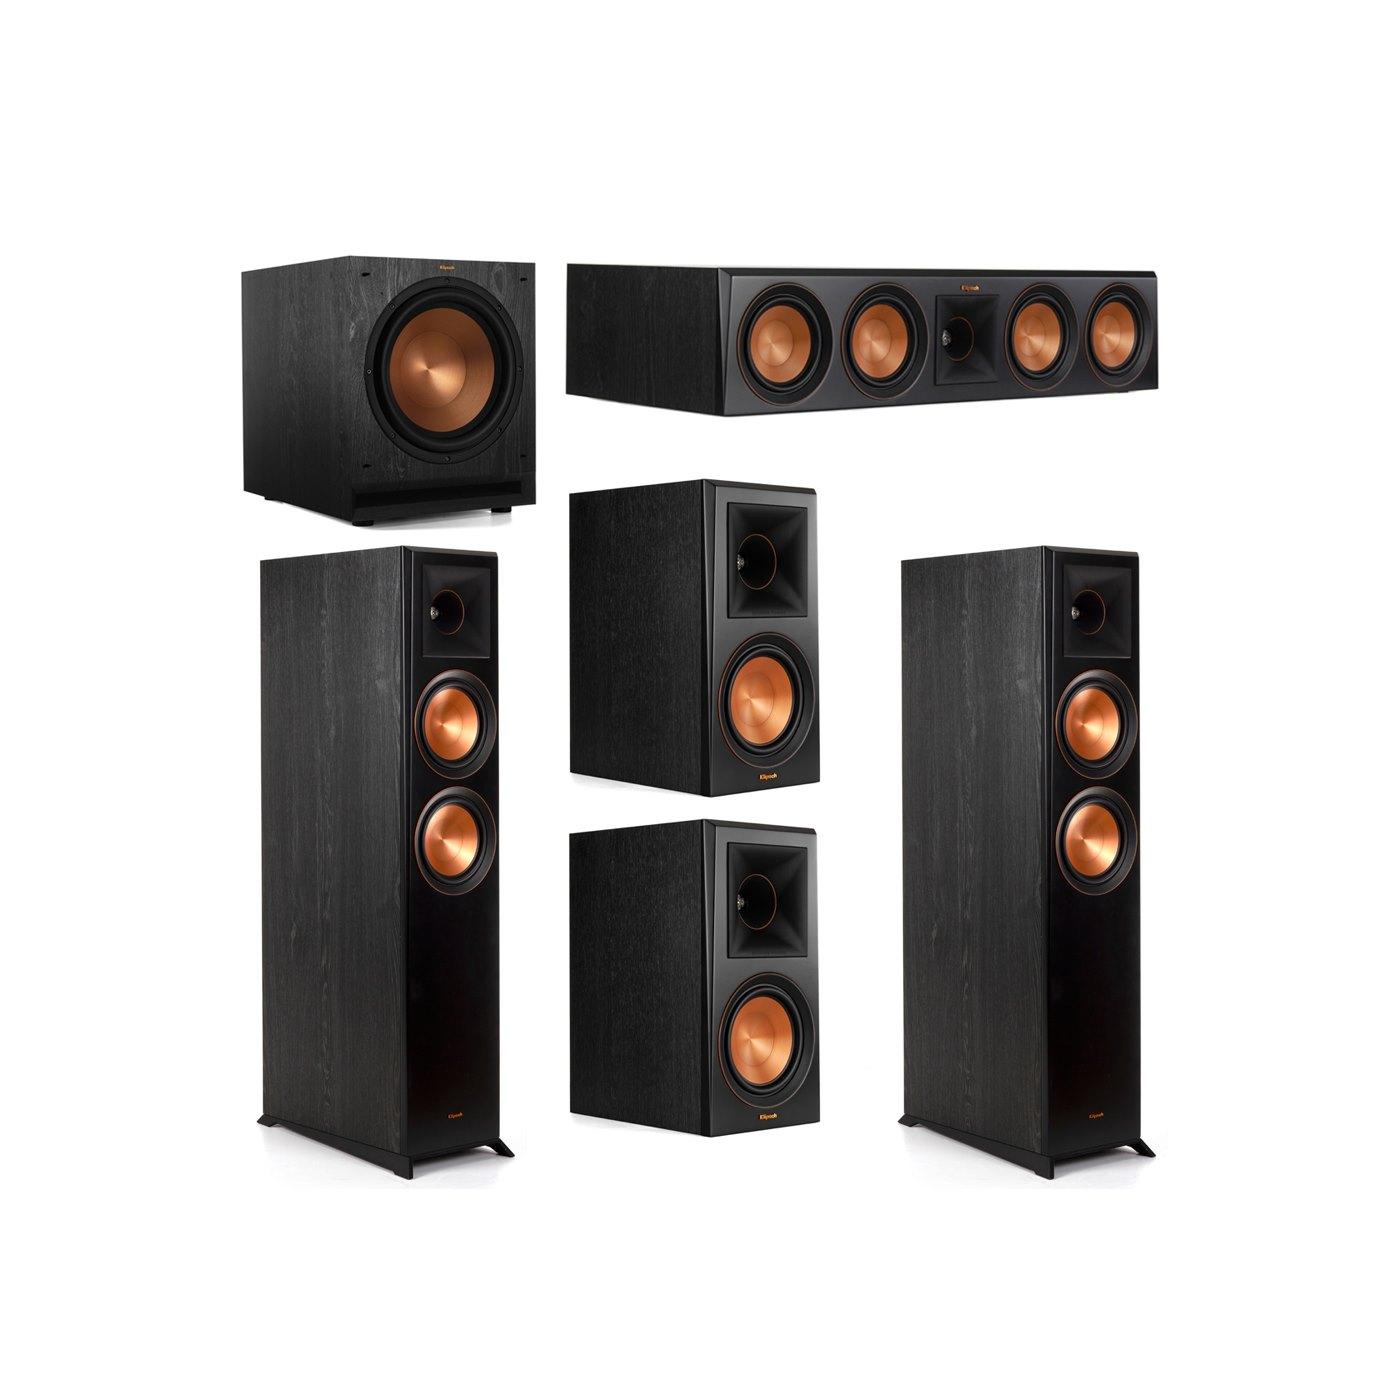 Klipsch 5.1 System with 2 RP-6000F Floorstanding Speakers, 1 Klipsch RP-504C Center Speaker, 2 Klipsch RP-600M Surround Speakers, 1 Klipsch SPL-120 Subwoofer